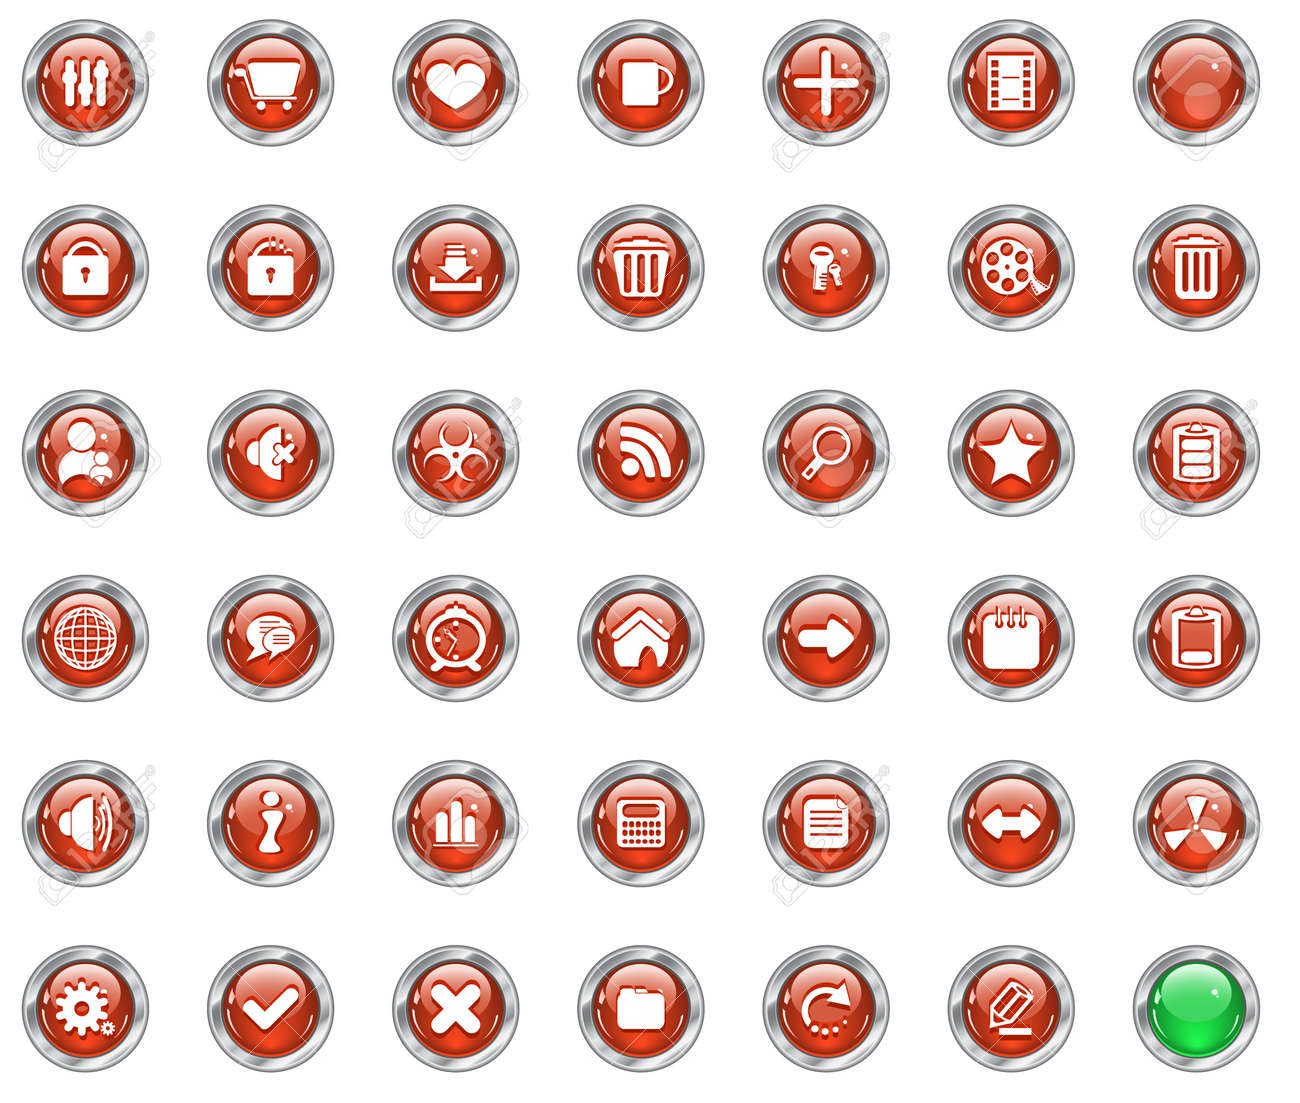 web buttons Stock Vector - 6641966